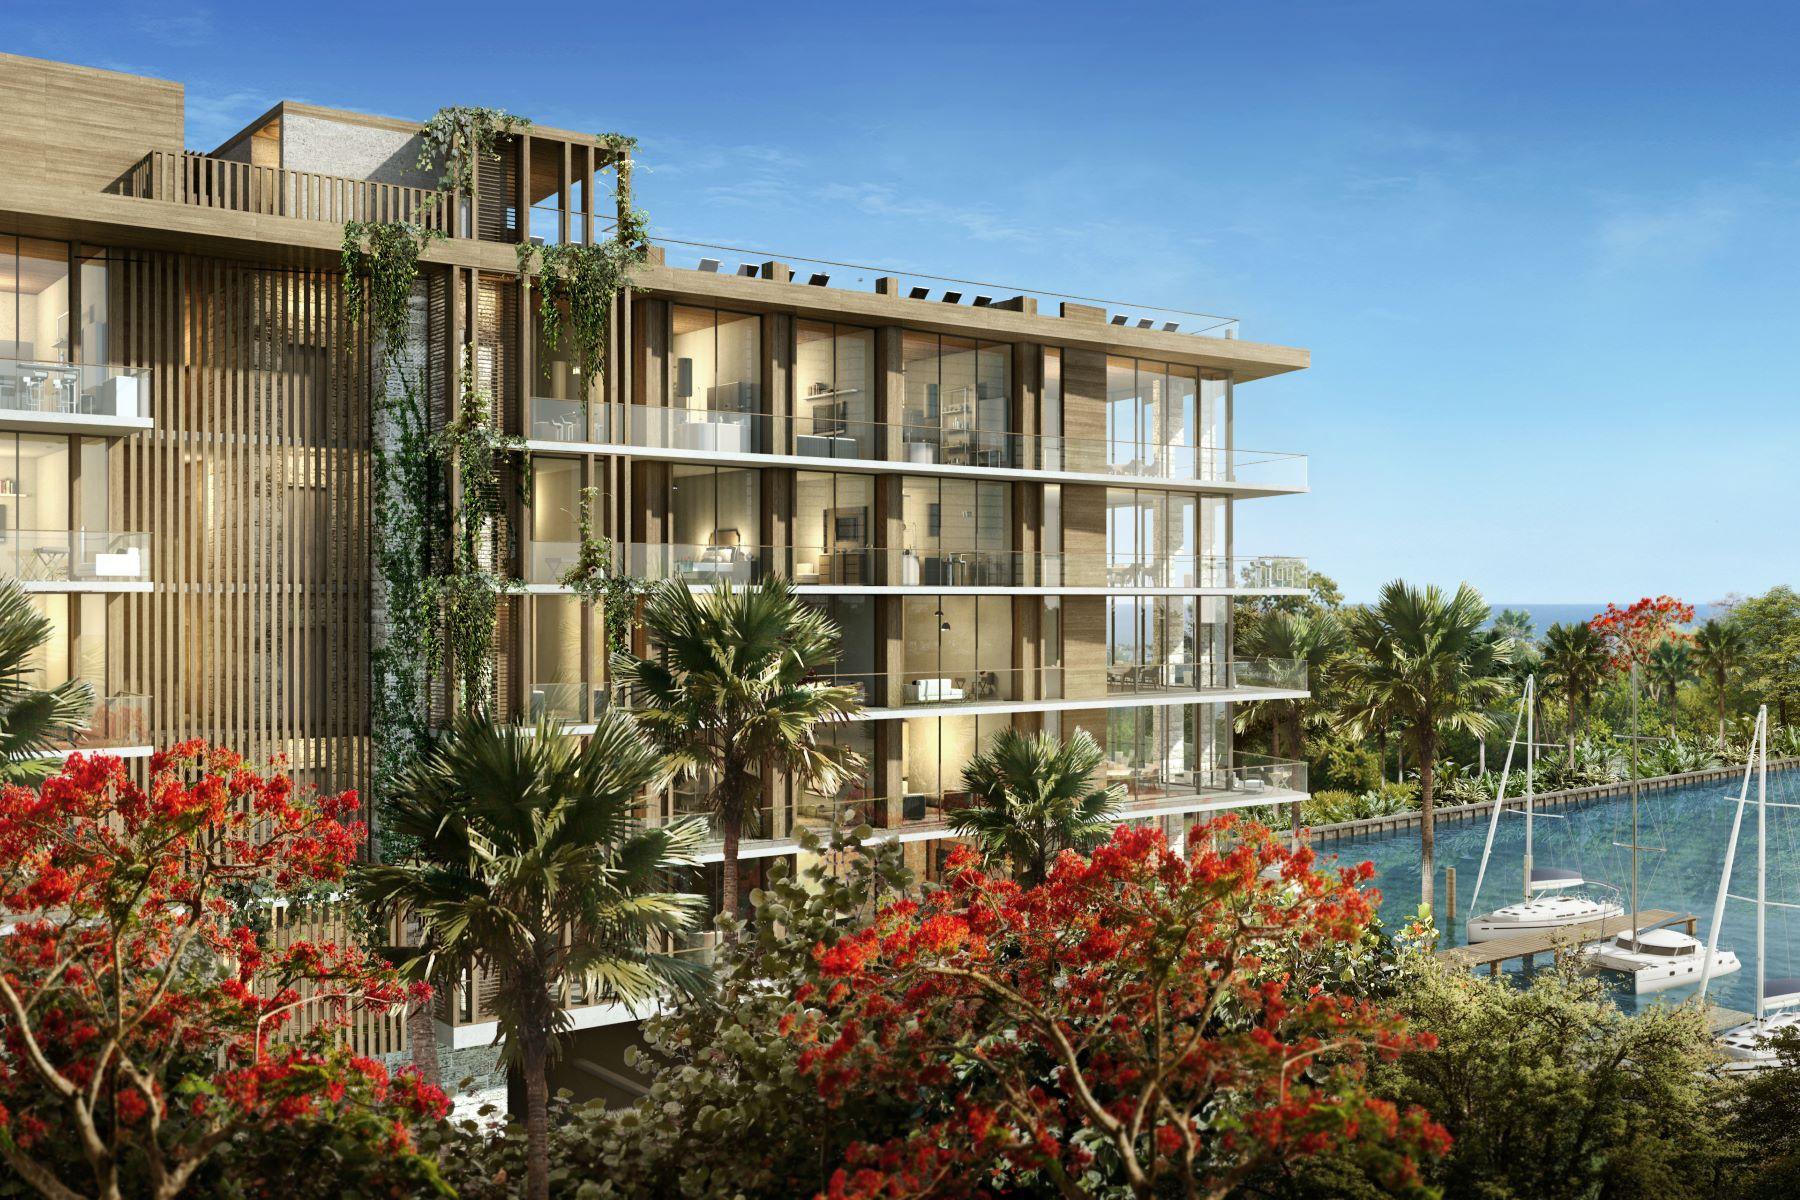 Condominium for Sale at 3581 E Glencoe Street 3581 E Glencoe Street 208 Coconut Grove, Florida 33133 United States